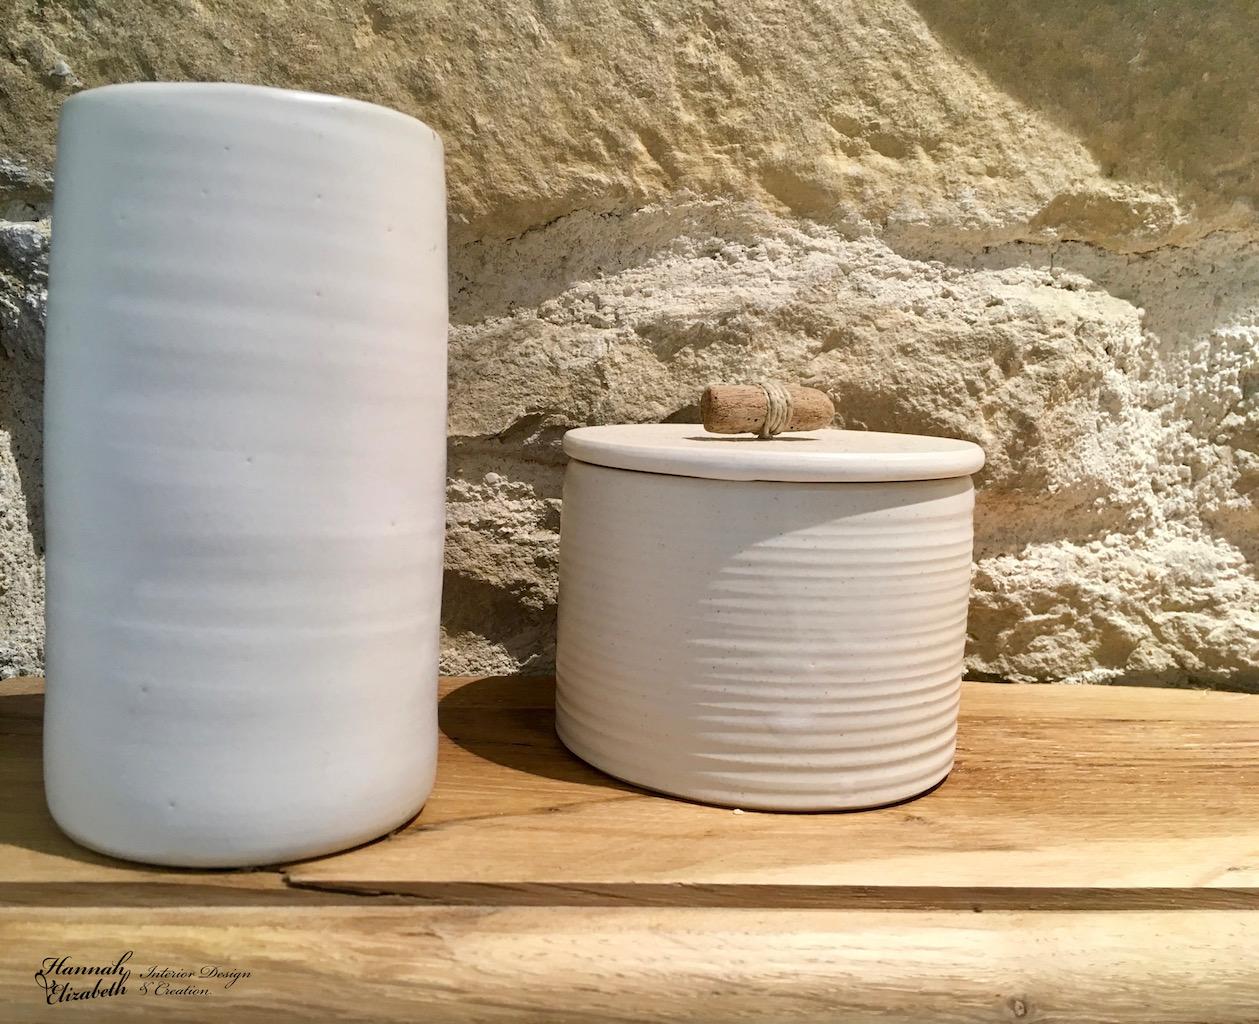 Ceramique blanc salle de bain pierre hannah elizabeth interior design